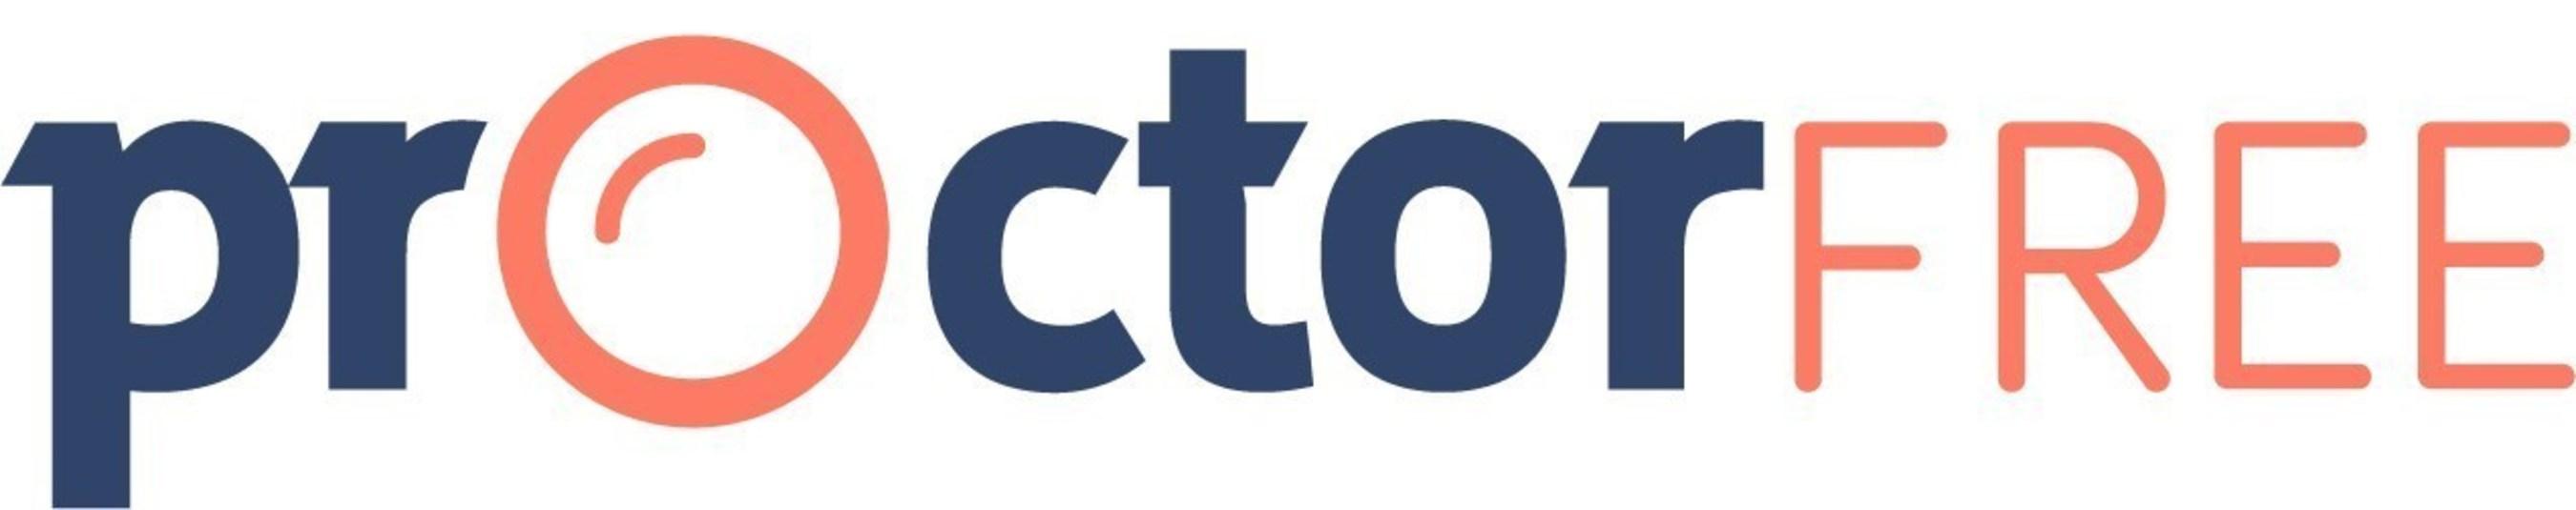 Charlotte EdTech Company Raises Funding, Closes Big Partnerships